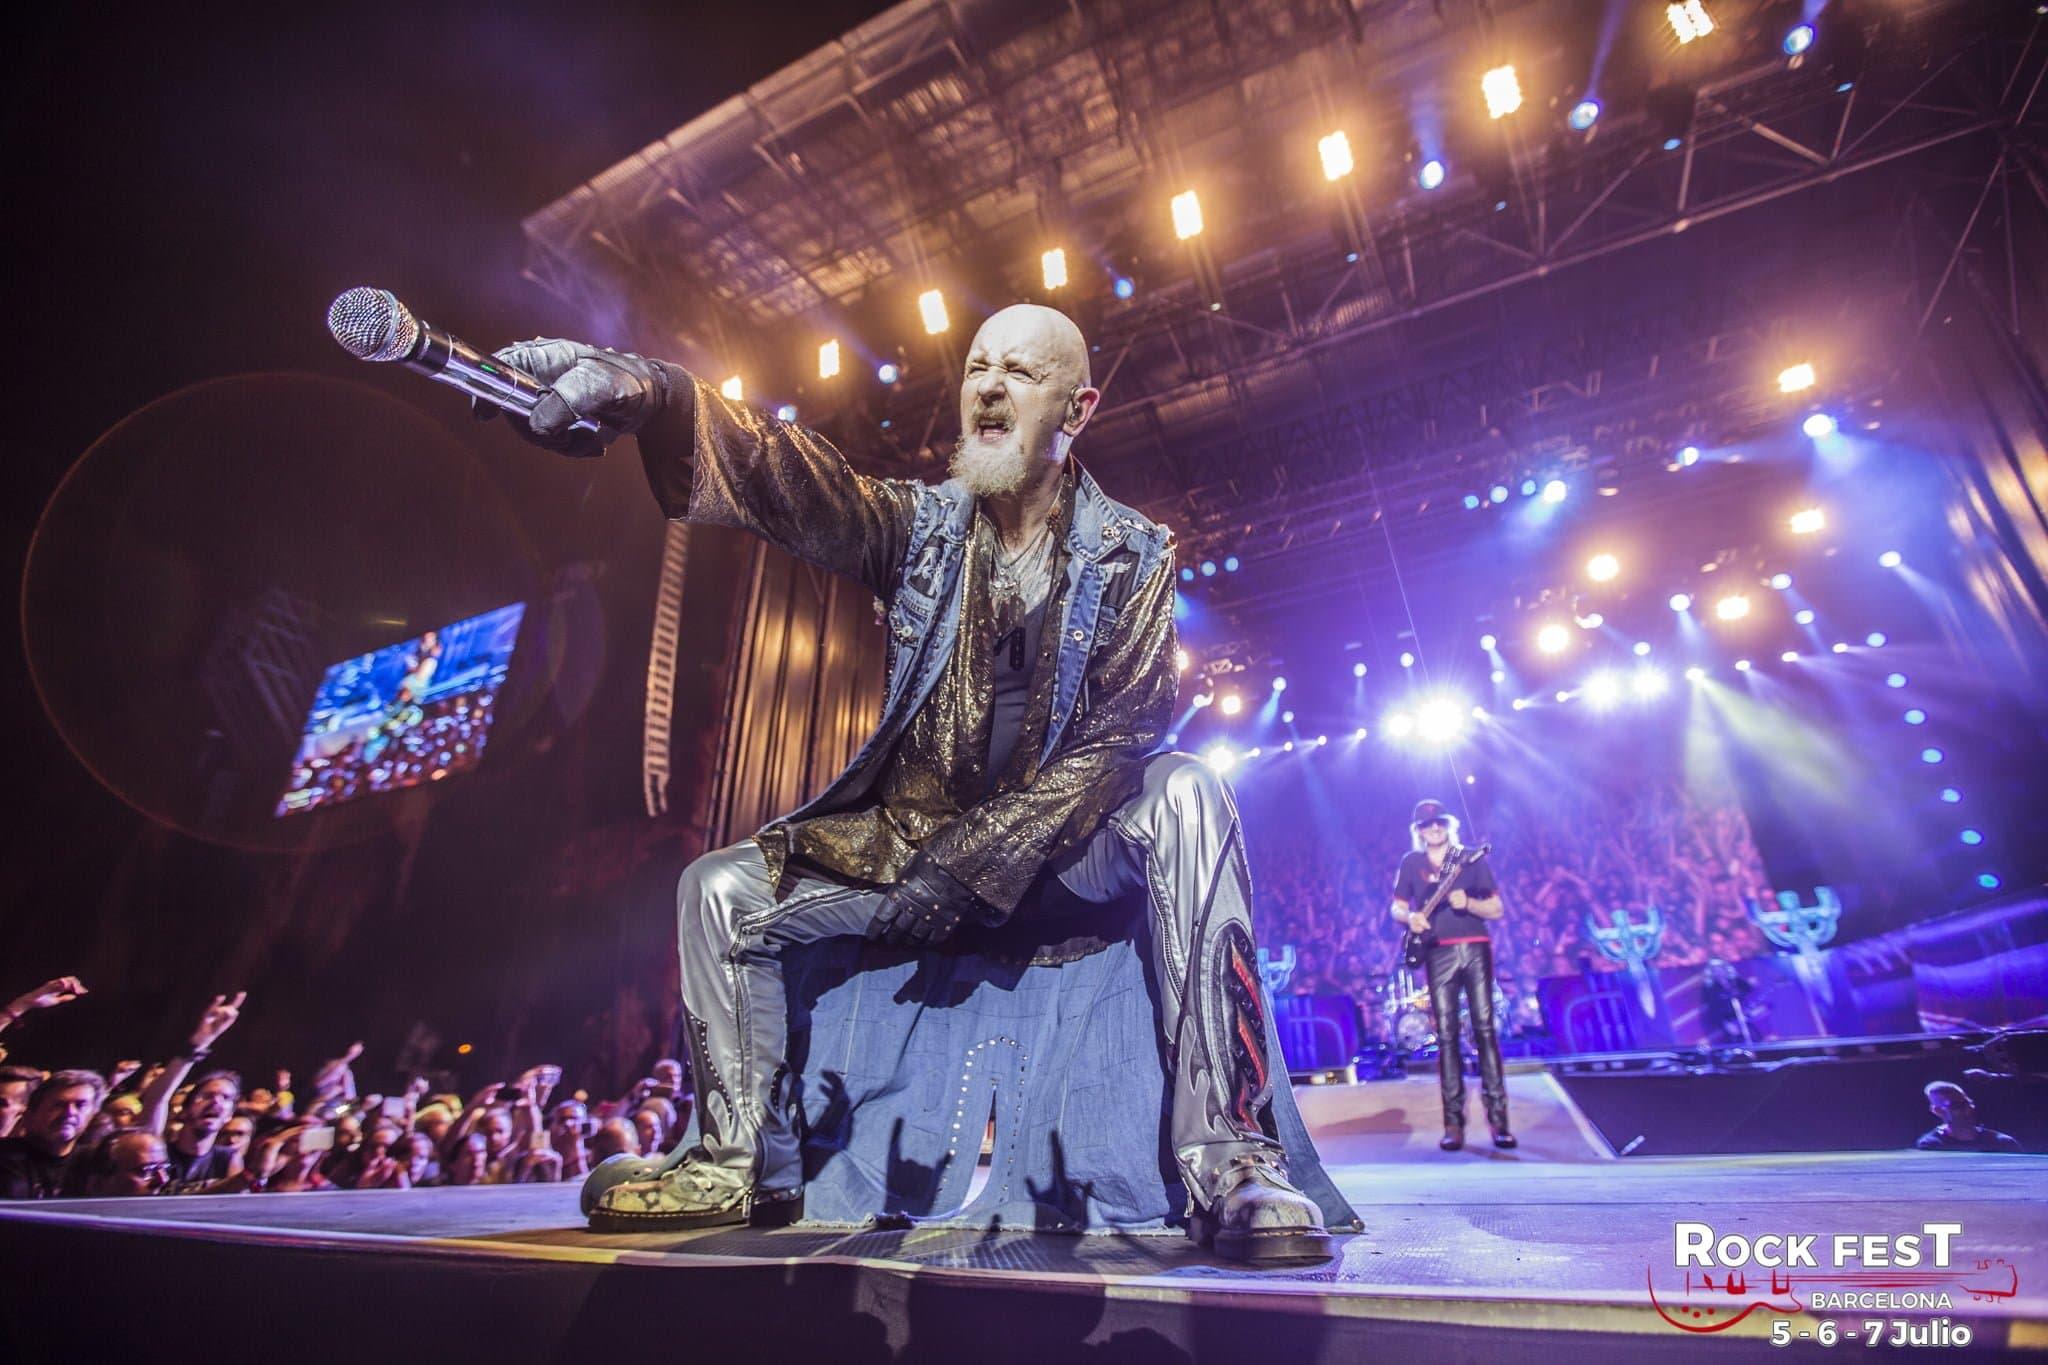 Judas Priest Rock Fest Barcelona